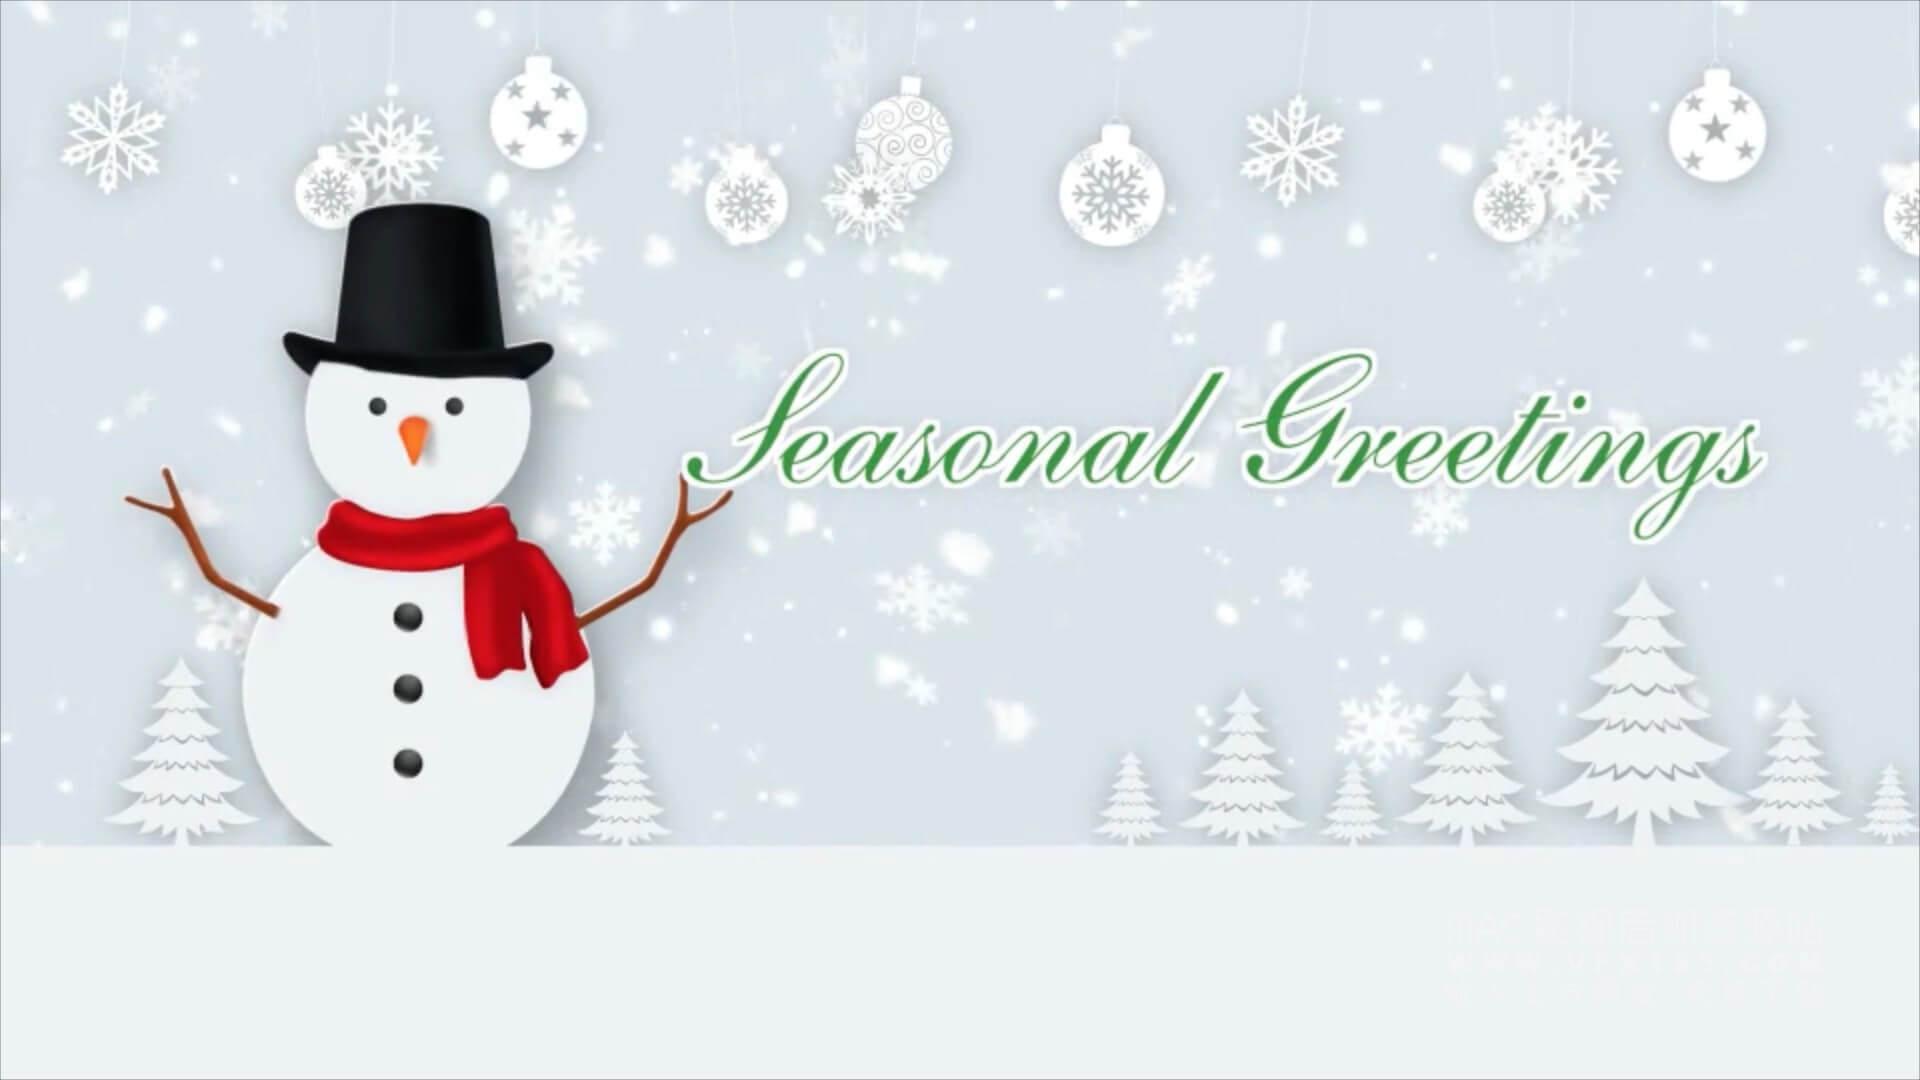 Motion模板 圣诞节祝福愿望片头 剪纸风格 Christmas Wishes Text